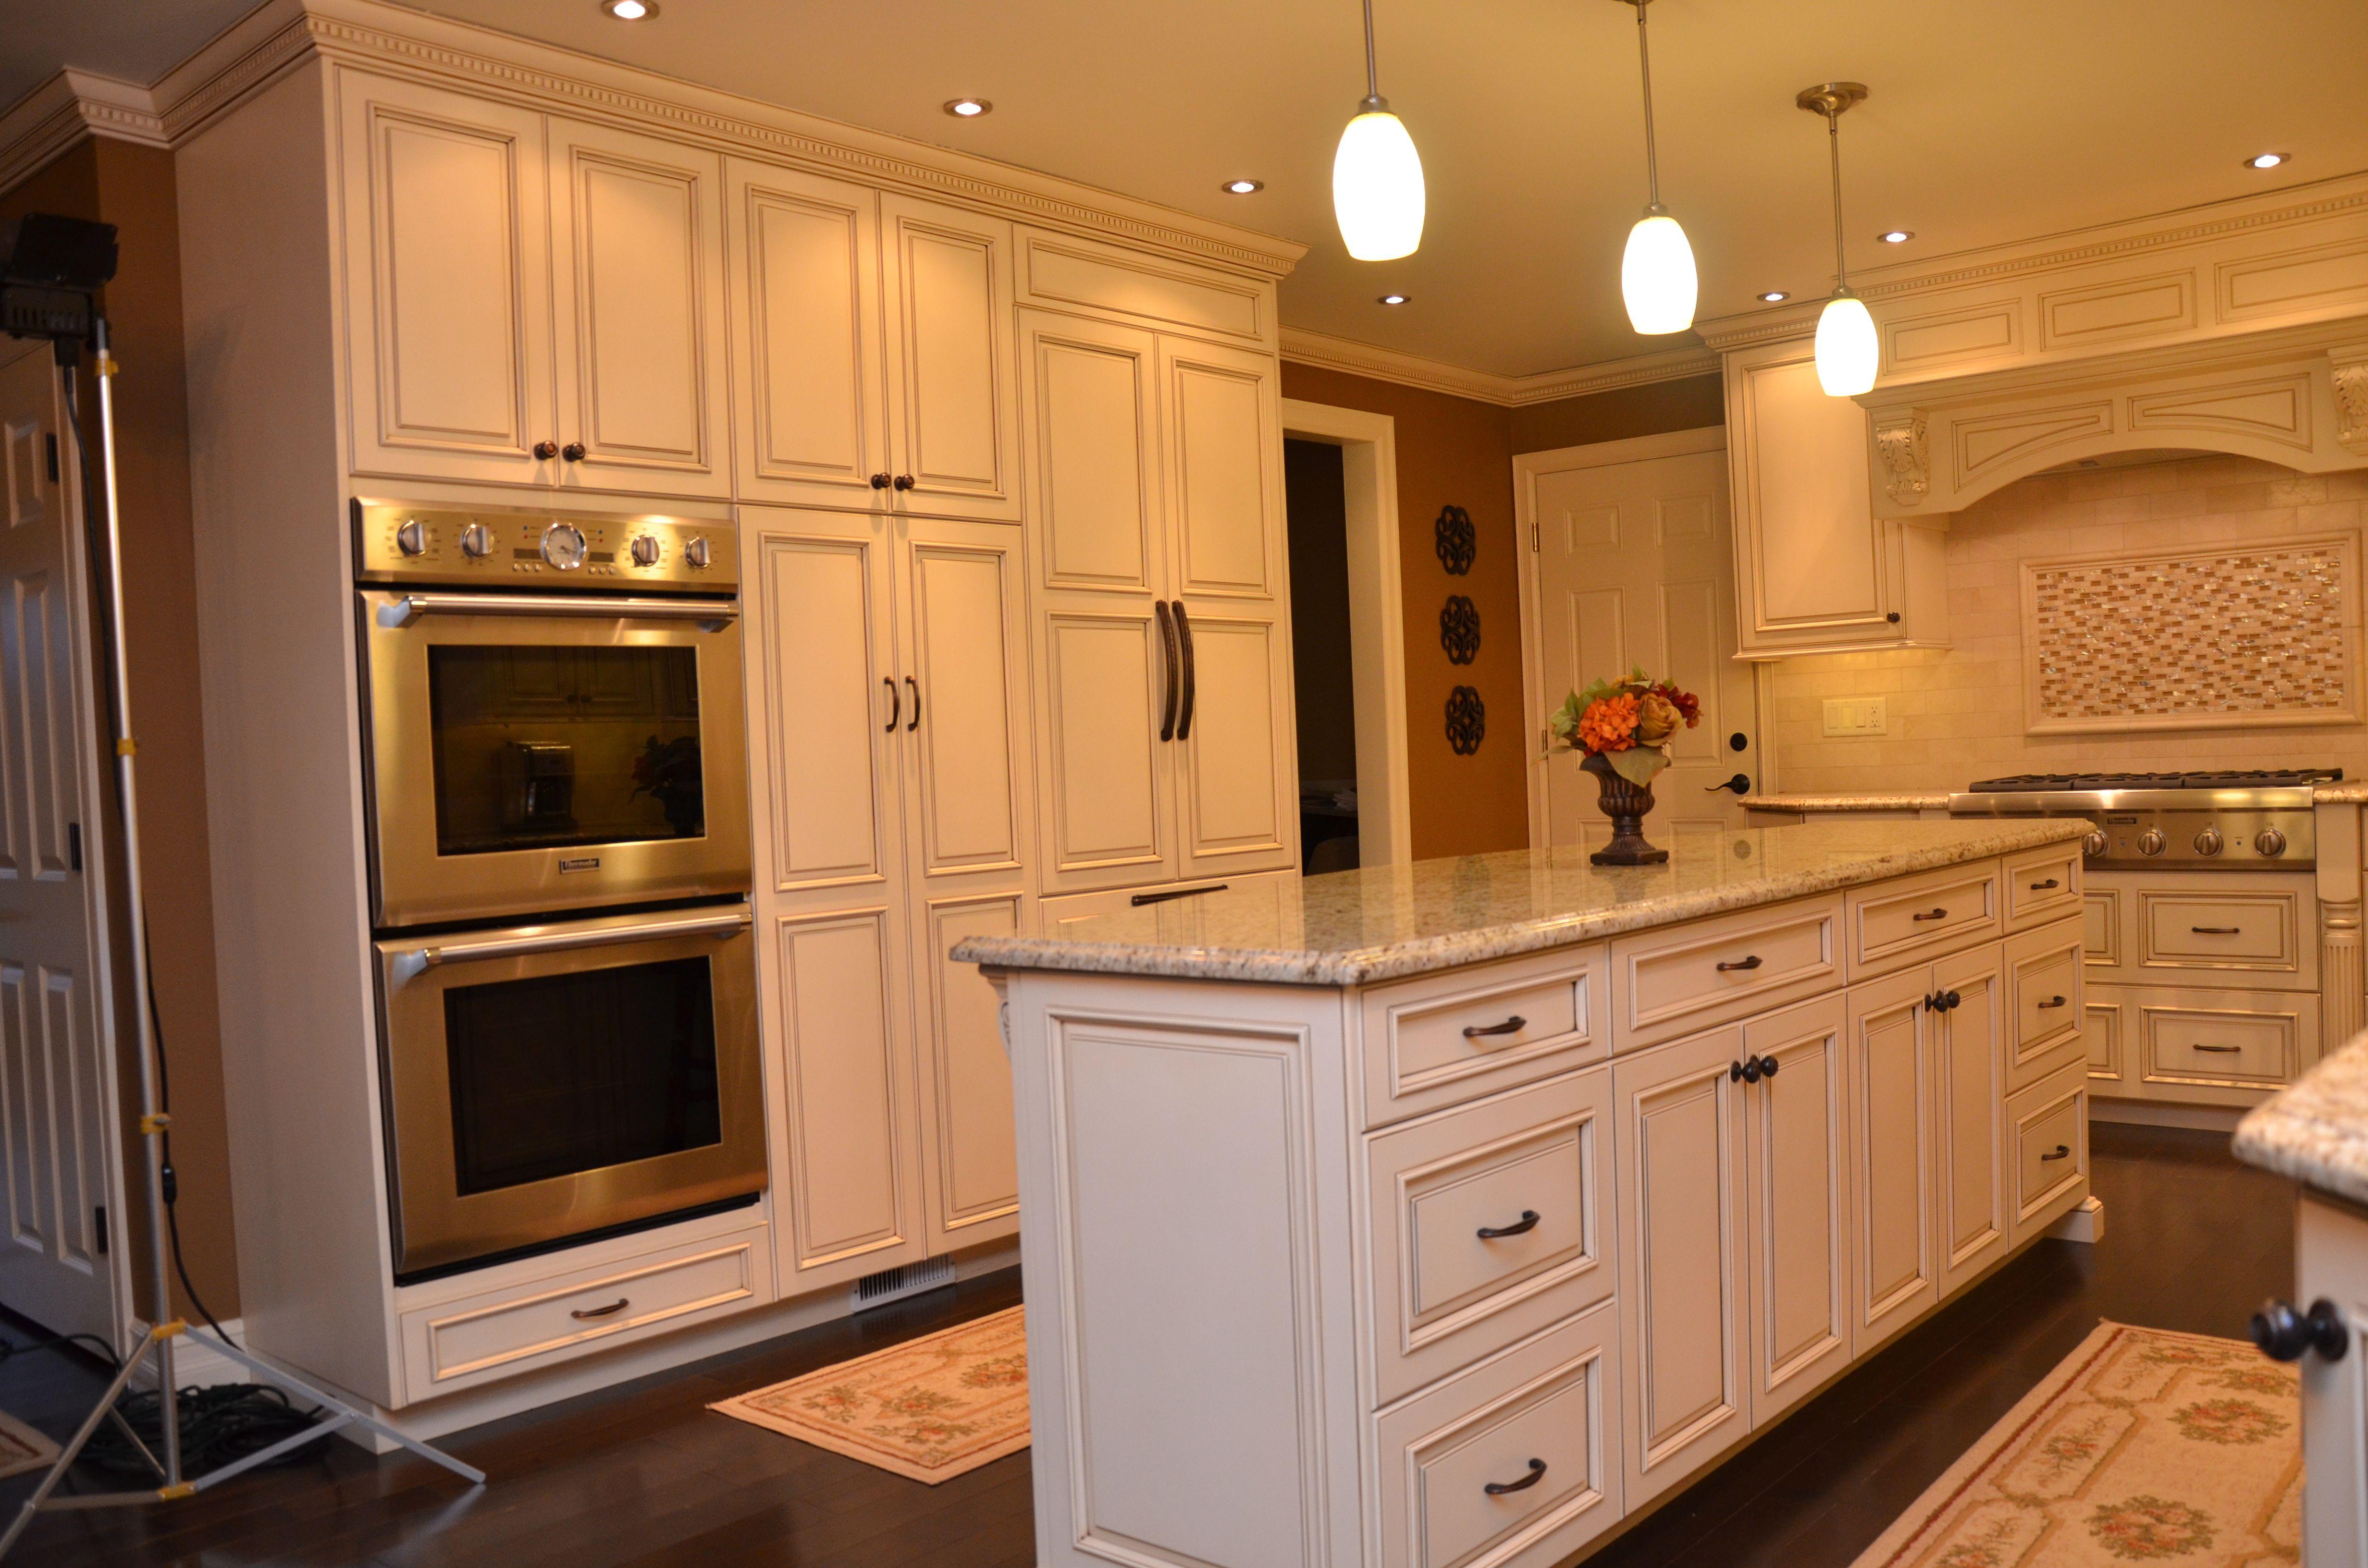 Decorative Glazed Cabinets In Marlboro Custom Kitchen Cabinets Design Custom Kitchen Cabinets Kitchen Cabinet Design